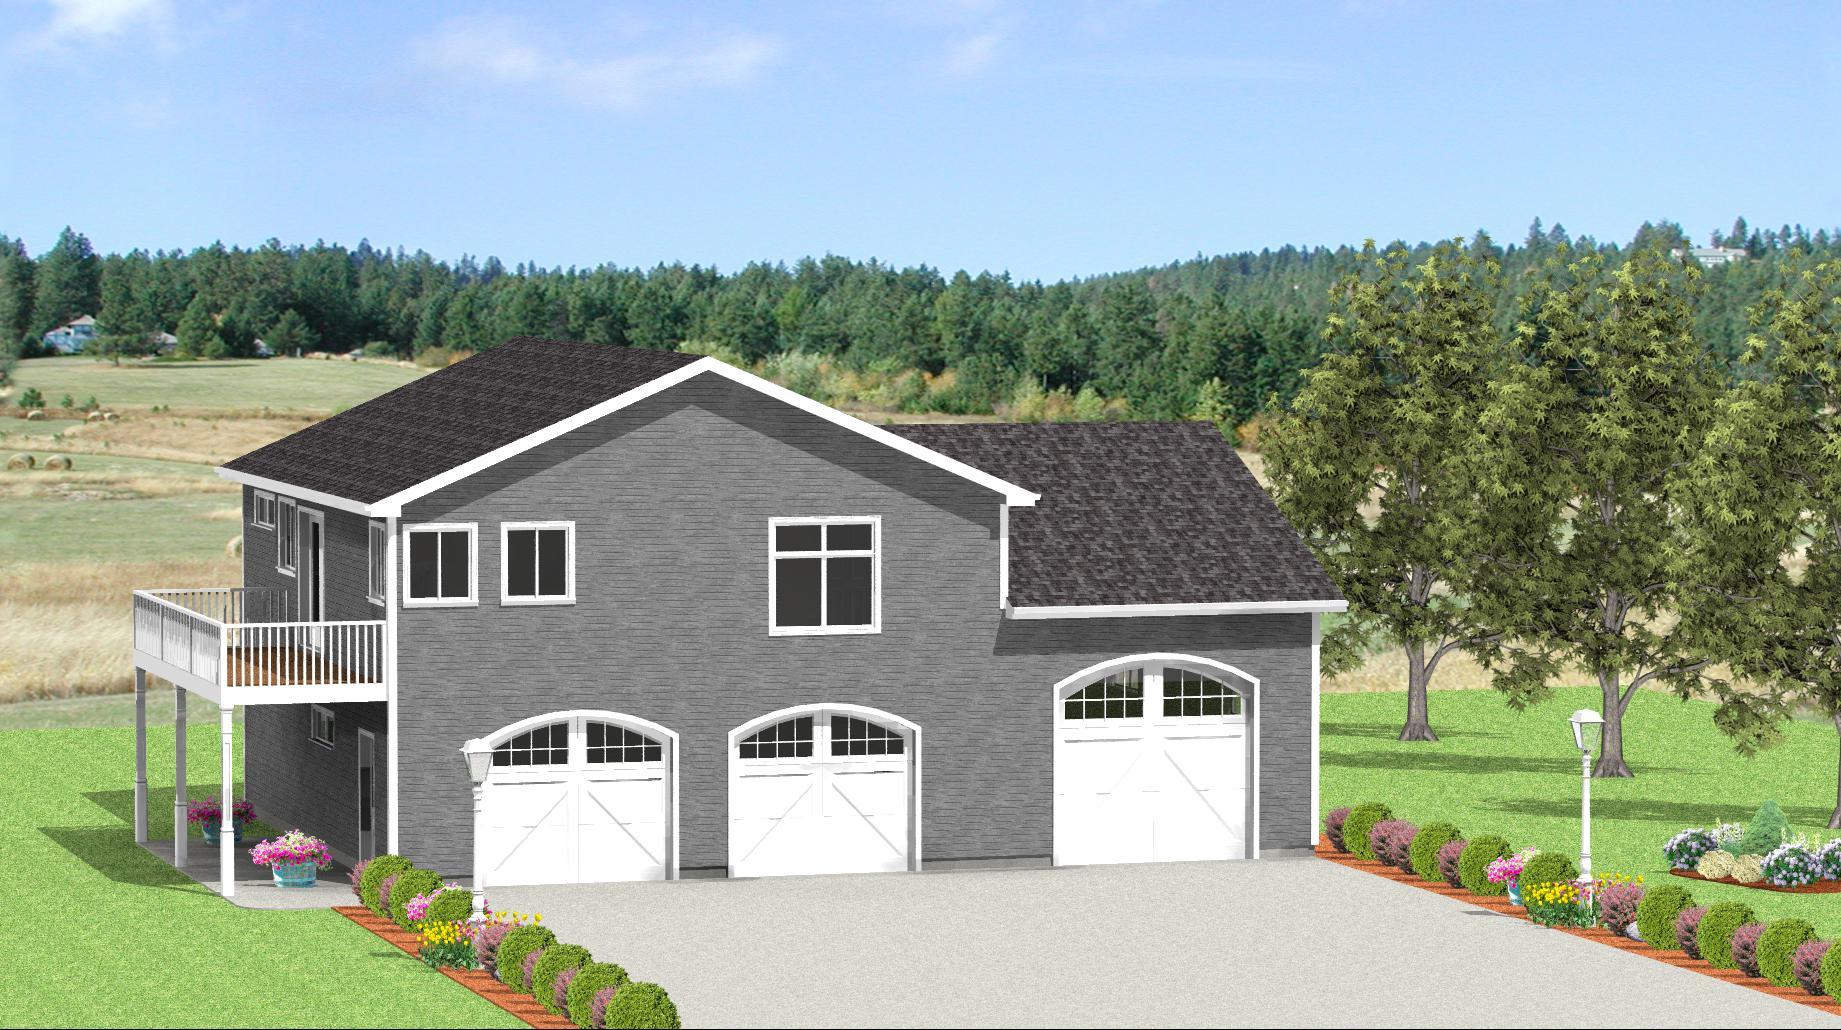 Remarkable 3 Car Garage Plans From Design Connection Llc House Plans Largest Home Design Picture Inspirations Pitcheantrous